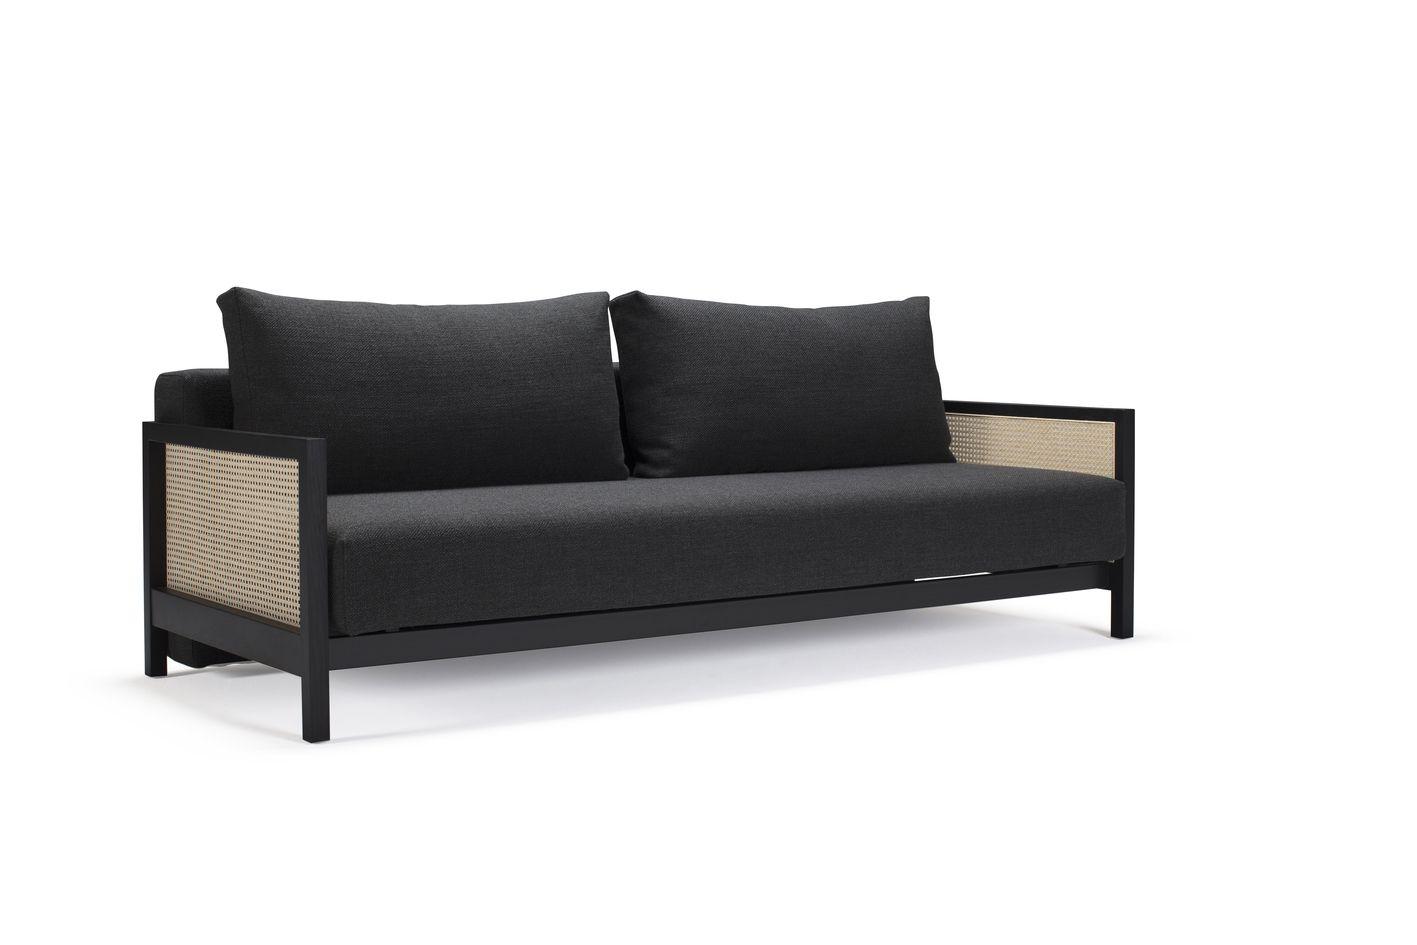 Narvi 140 X 200 Cm Schlafsofa Scandinavian Design Furniture Design Sofa Sofa Manufacturers